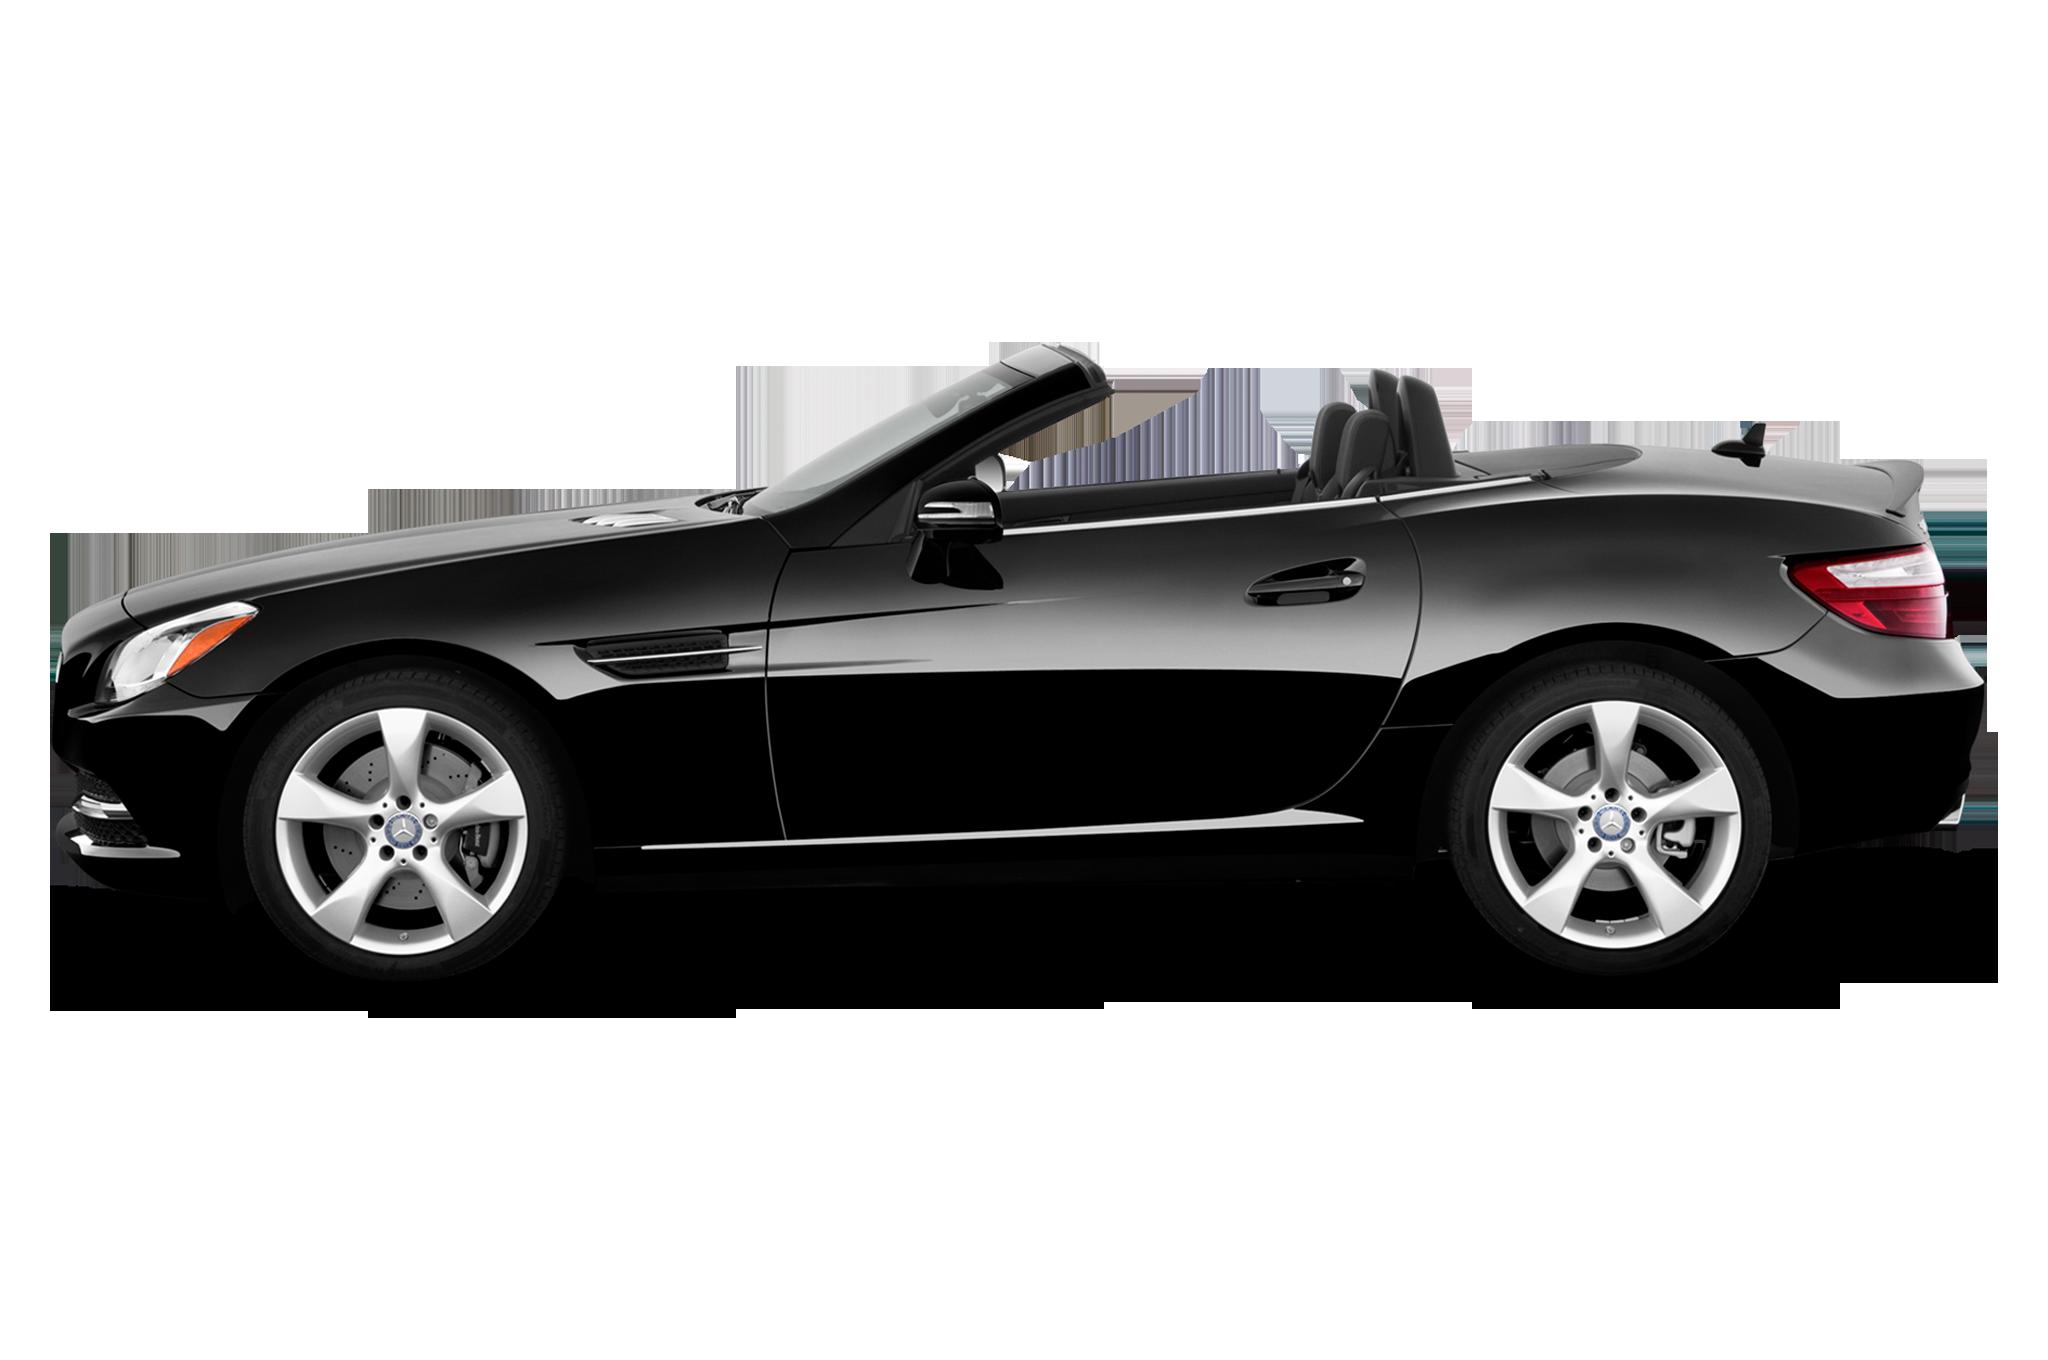 Top 10 most fuel efficient 400 horsepower sports cars for Most fuel efficient mercedes benz